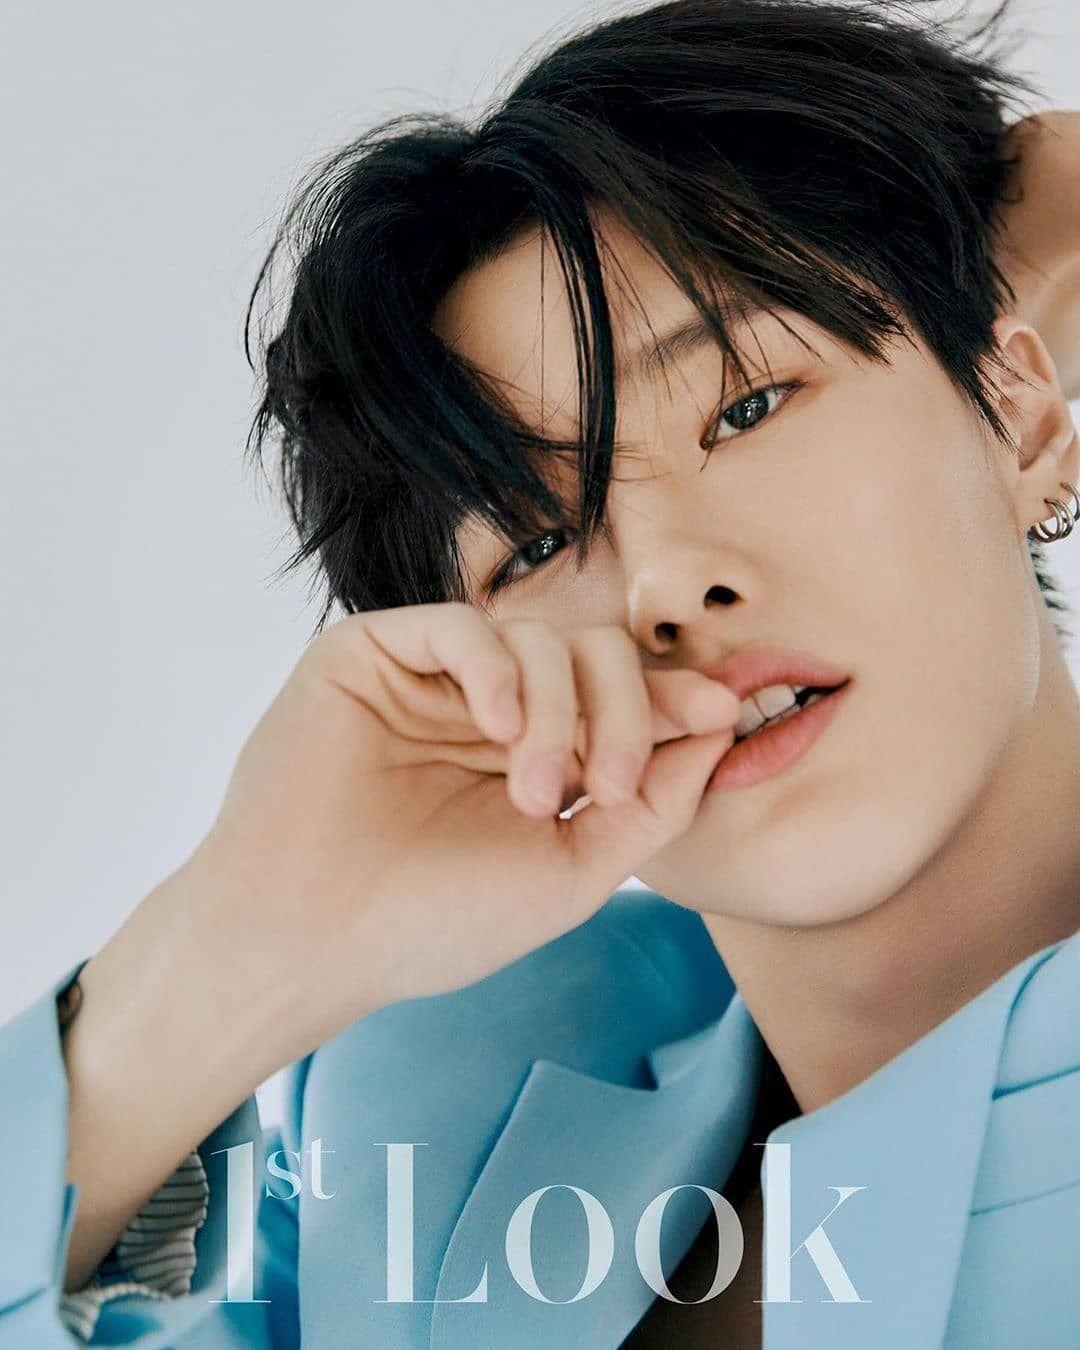 X Y On Instagram Why So Handsome Mah Love 5yearswithseungyoun Standupforx1 Ryeonseung Welovex1 Herefo Kpop Korean Artist Kpop Idol